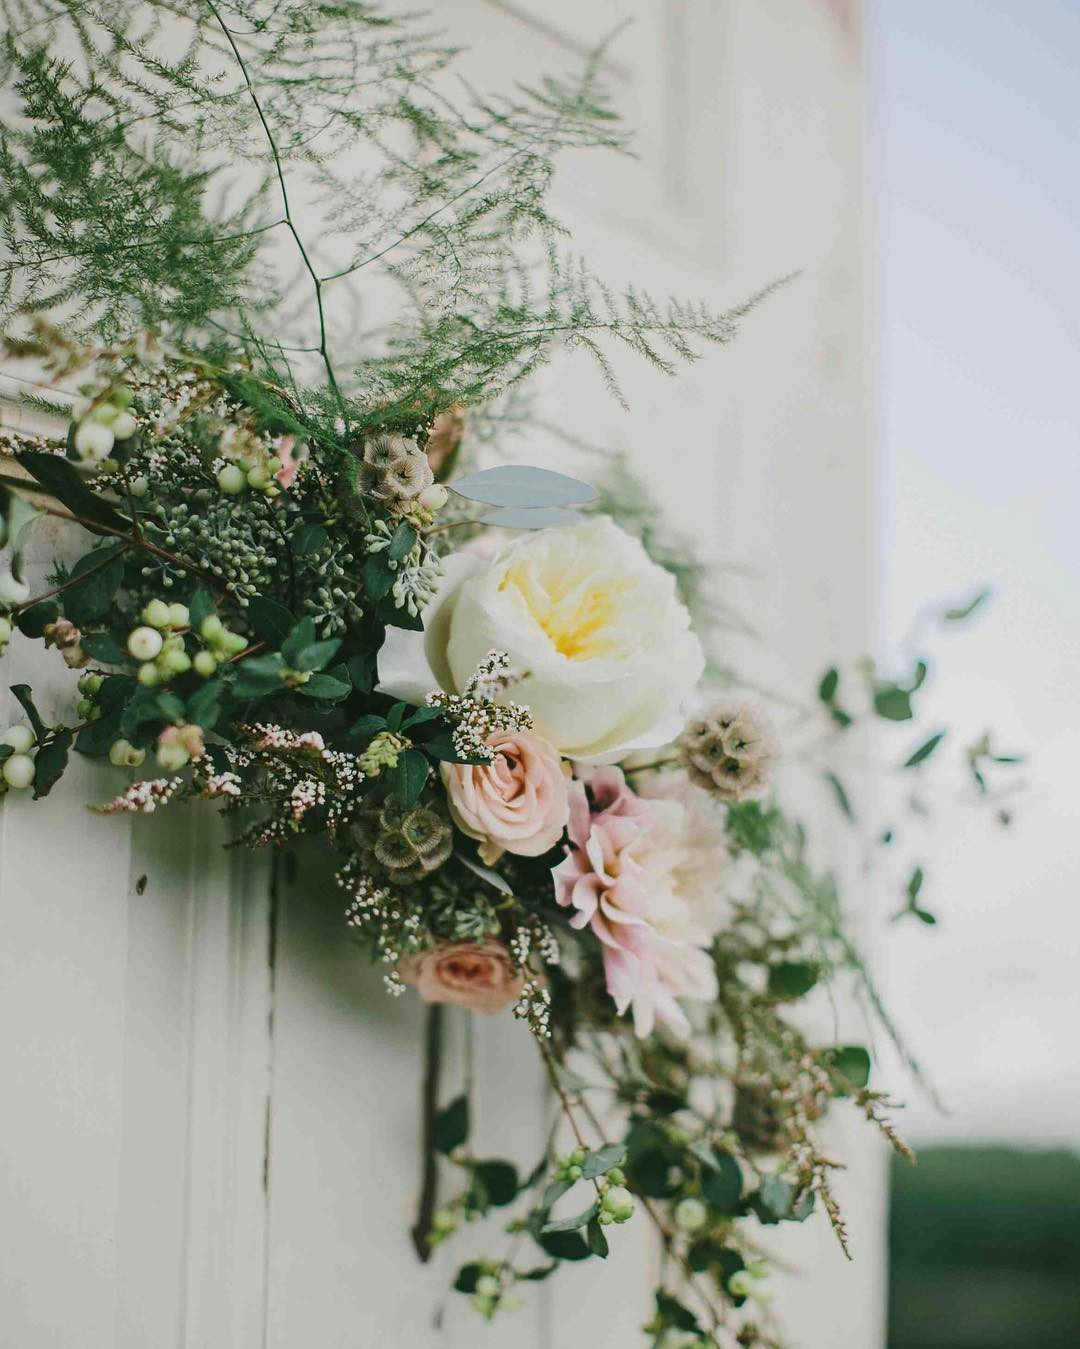 {flower love on reclaimed vintage door} photo | @emilydelamater  #kitzfarm #ceremony #vintagedoors #ceremonydecor #flowerswag #weddingflorist #flowerartist #lotusfloraldesigns #flowerlover